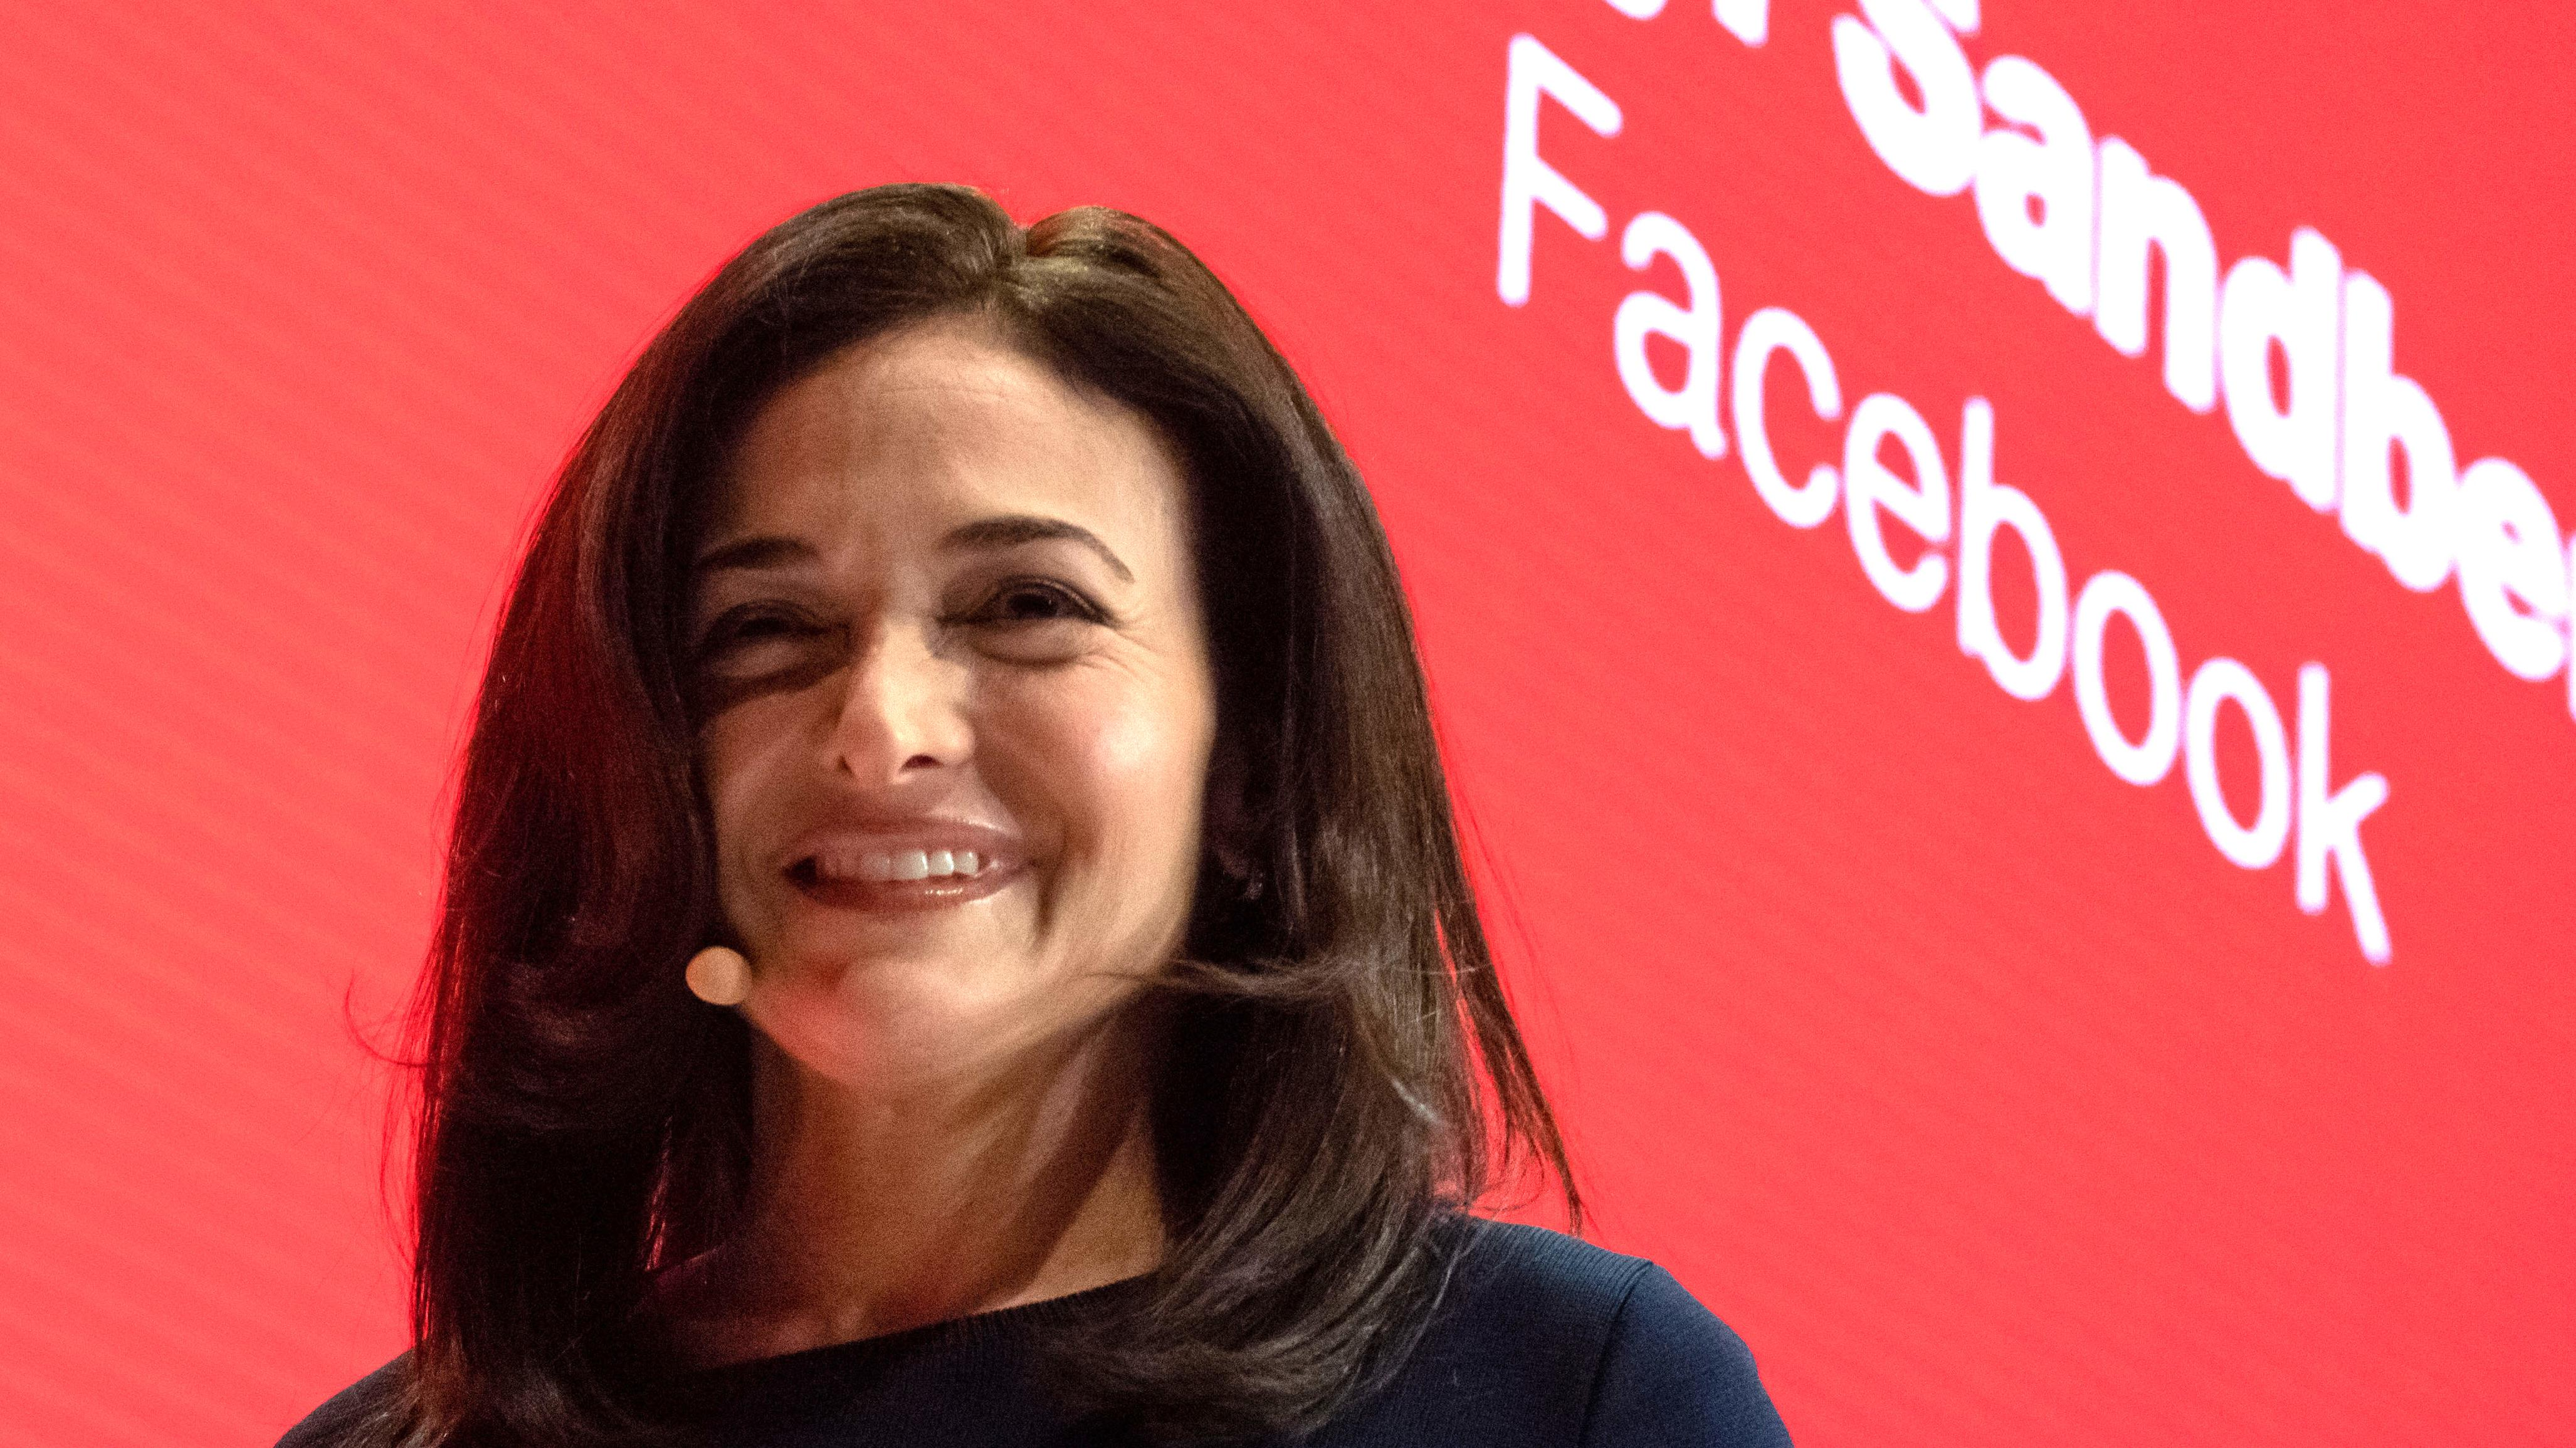 Facebooks Vize-Chefin Sheryl Sandberg auf der DLD